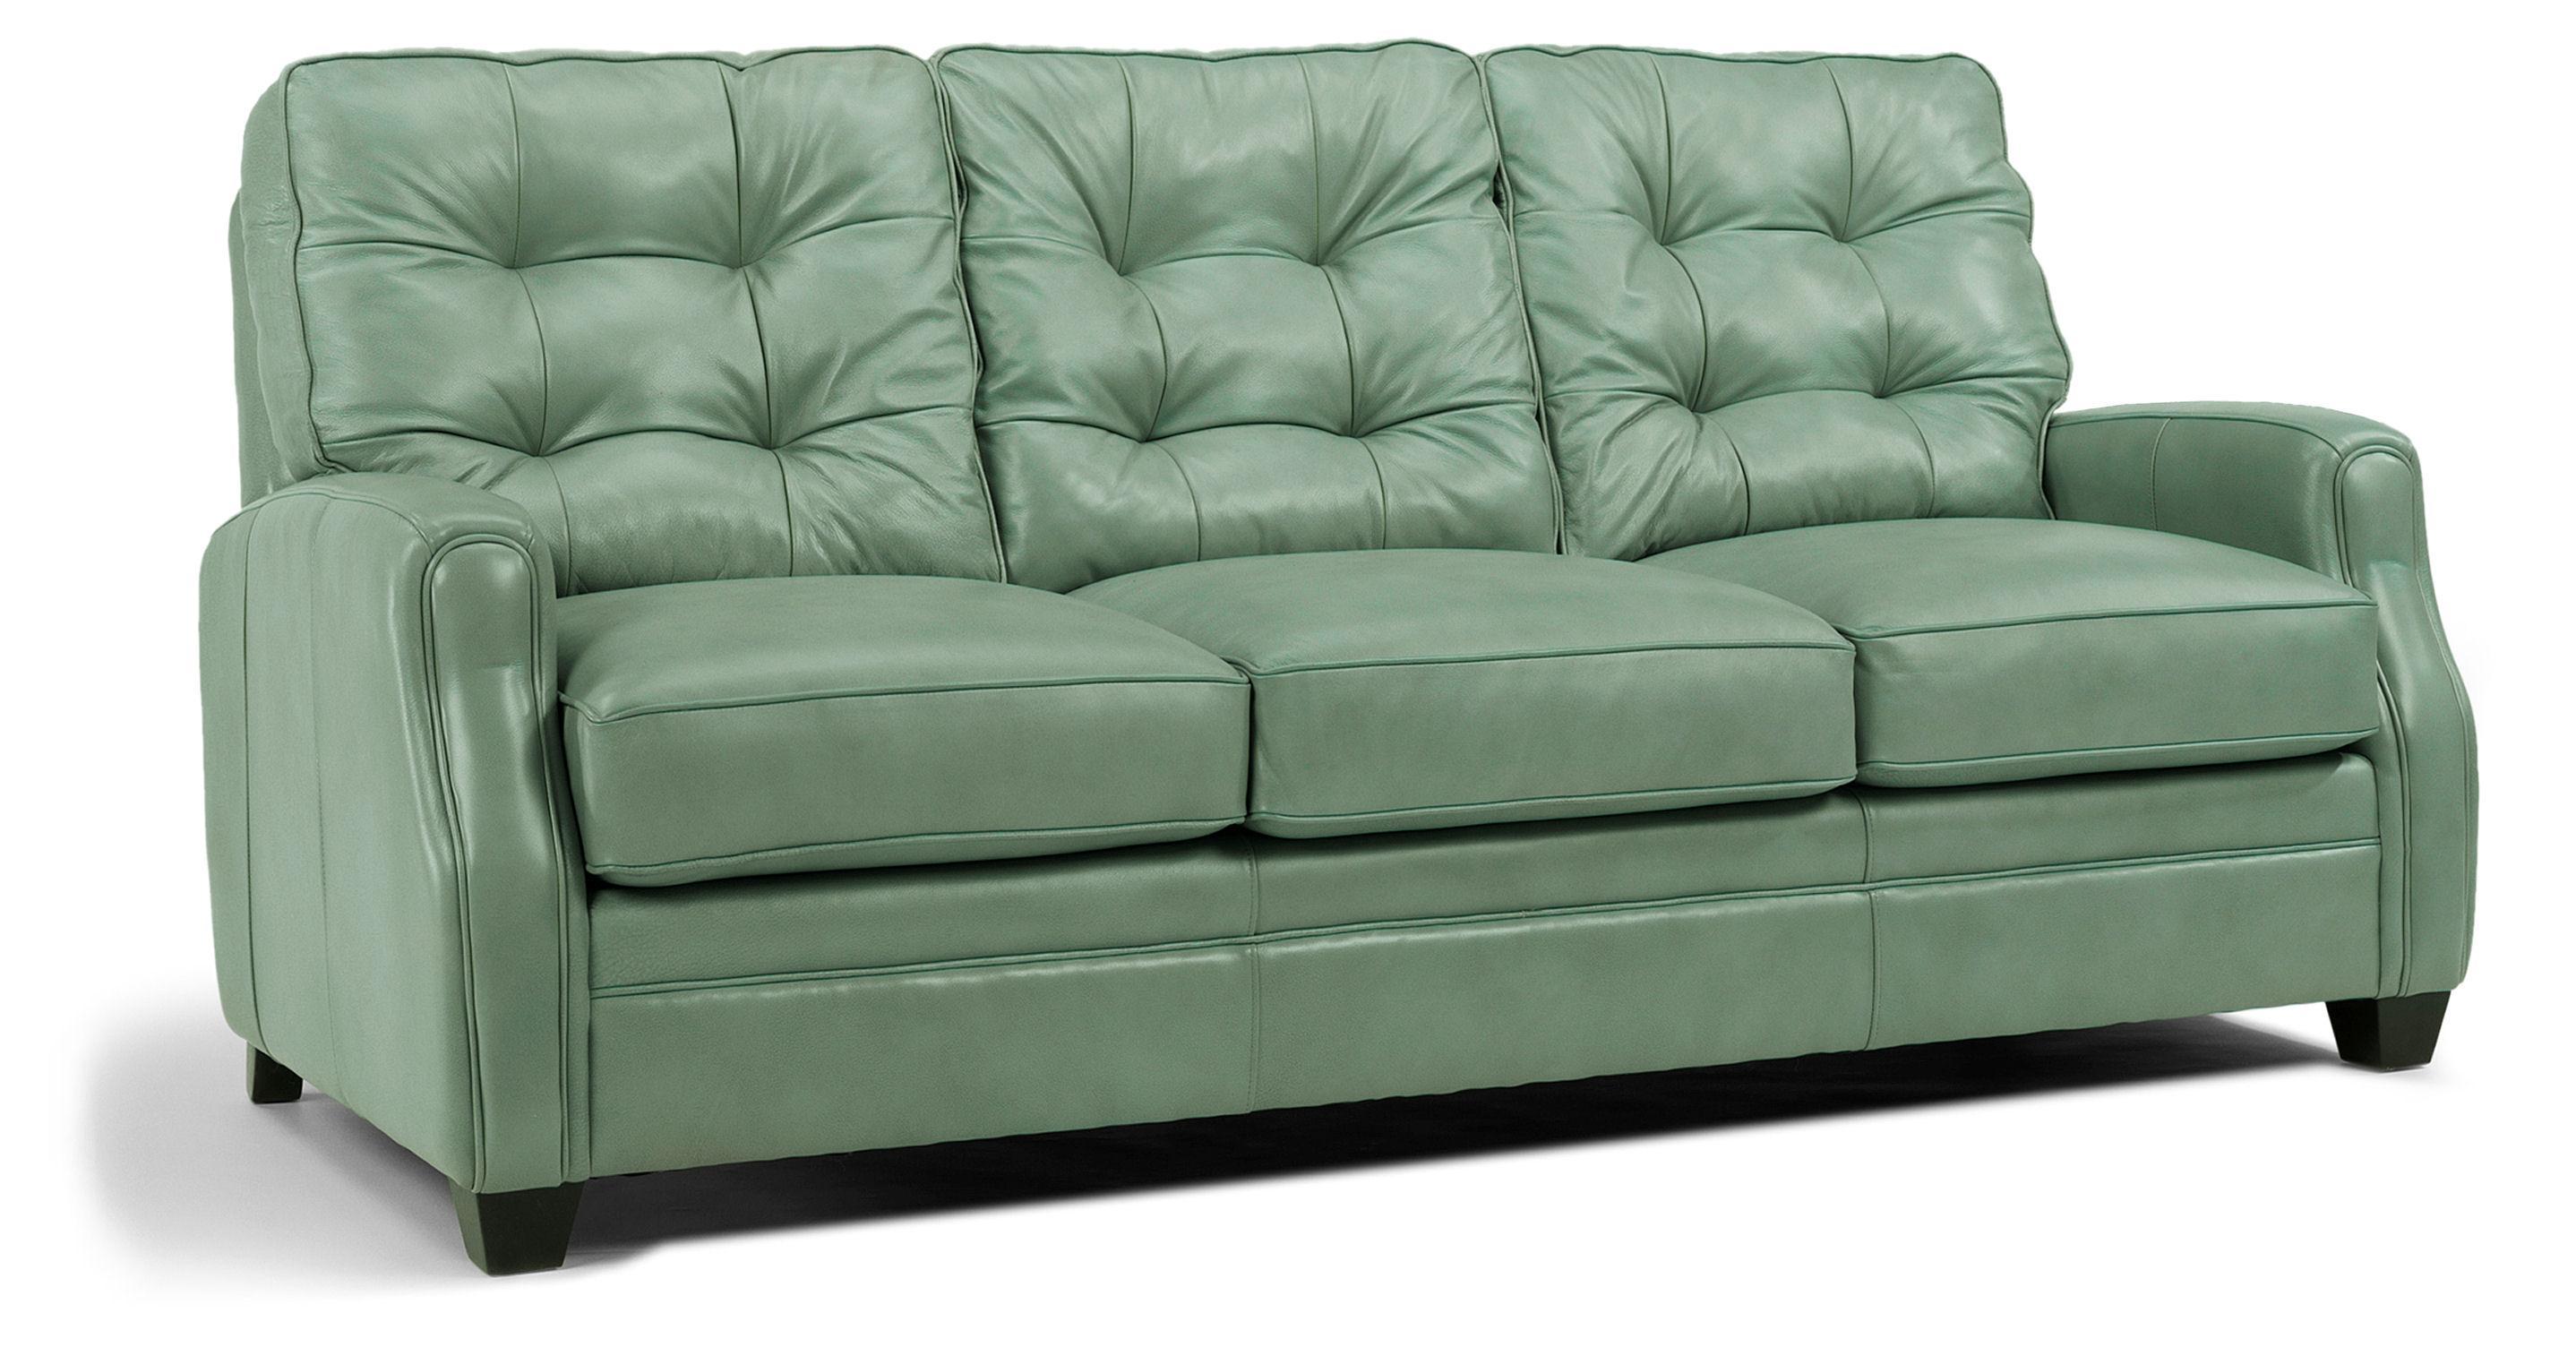 flexsteel latitudes flamenco upholstered sofa w